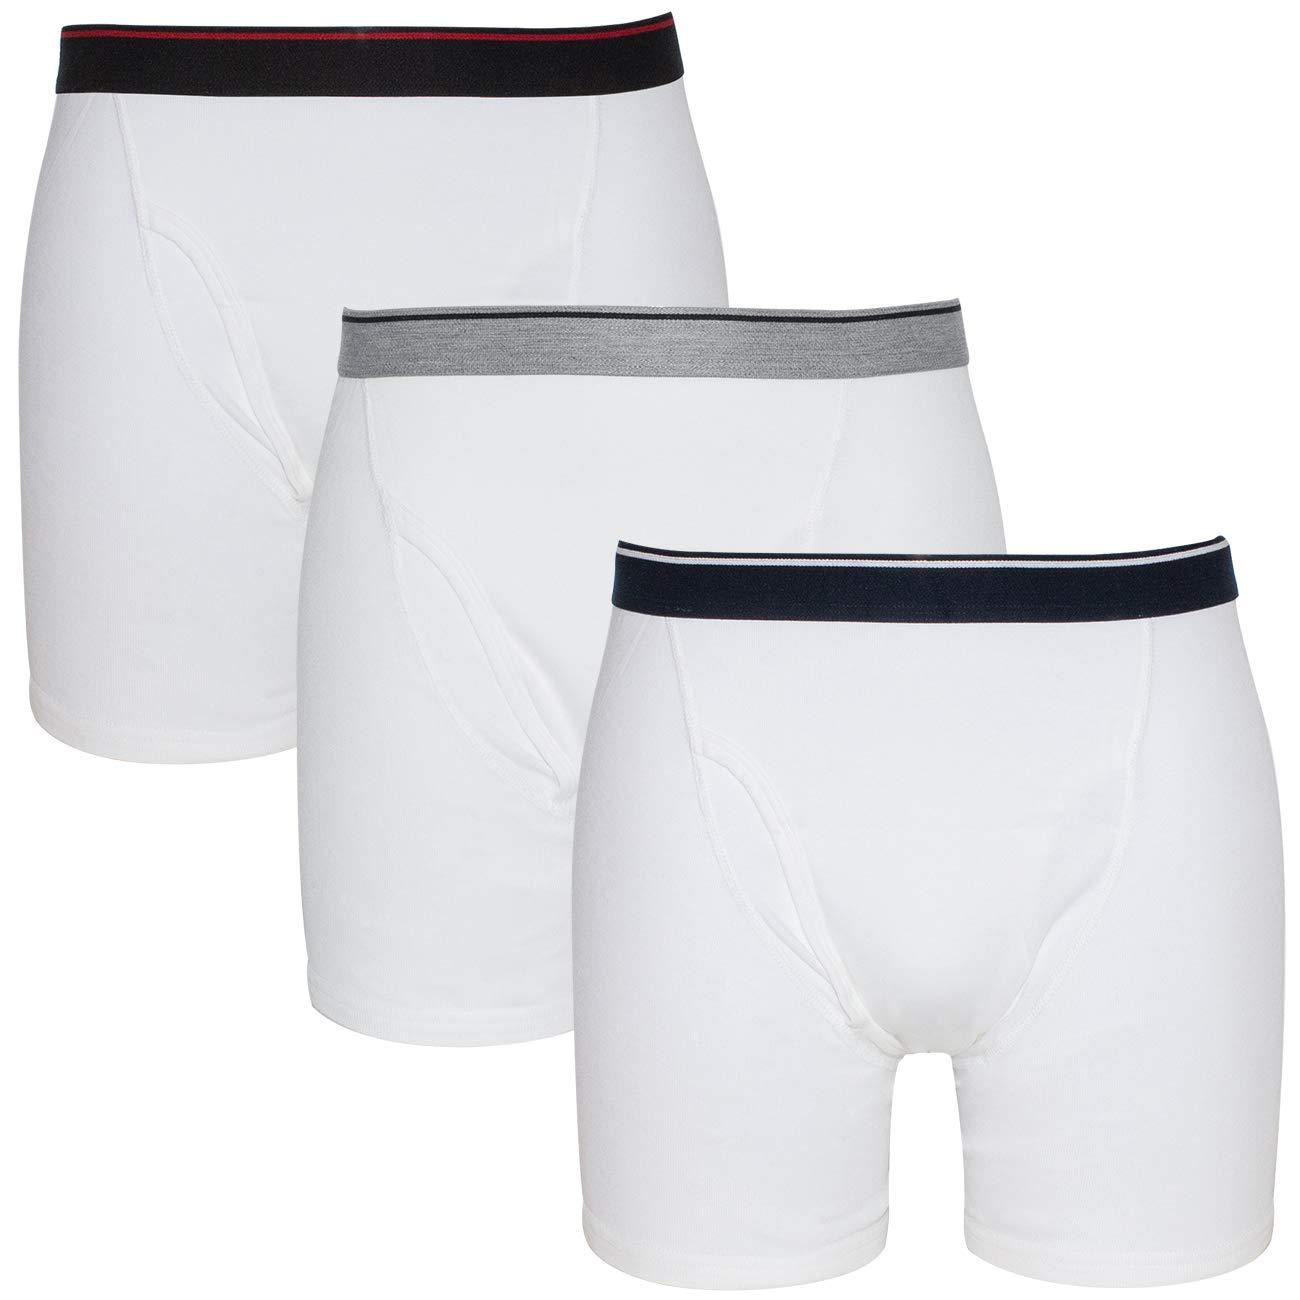 64032dc2b51 American Casual Mens Underwear Boxer Briefs